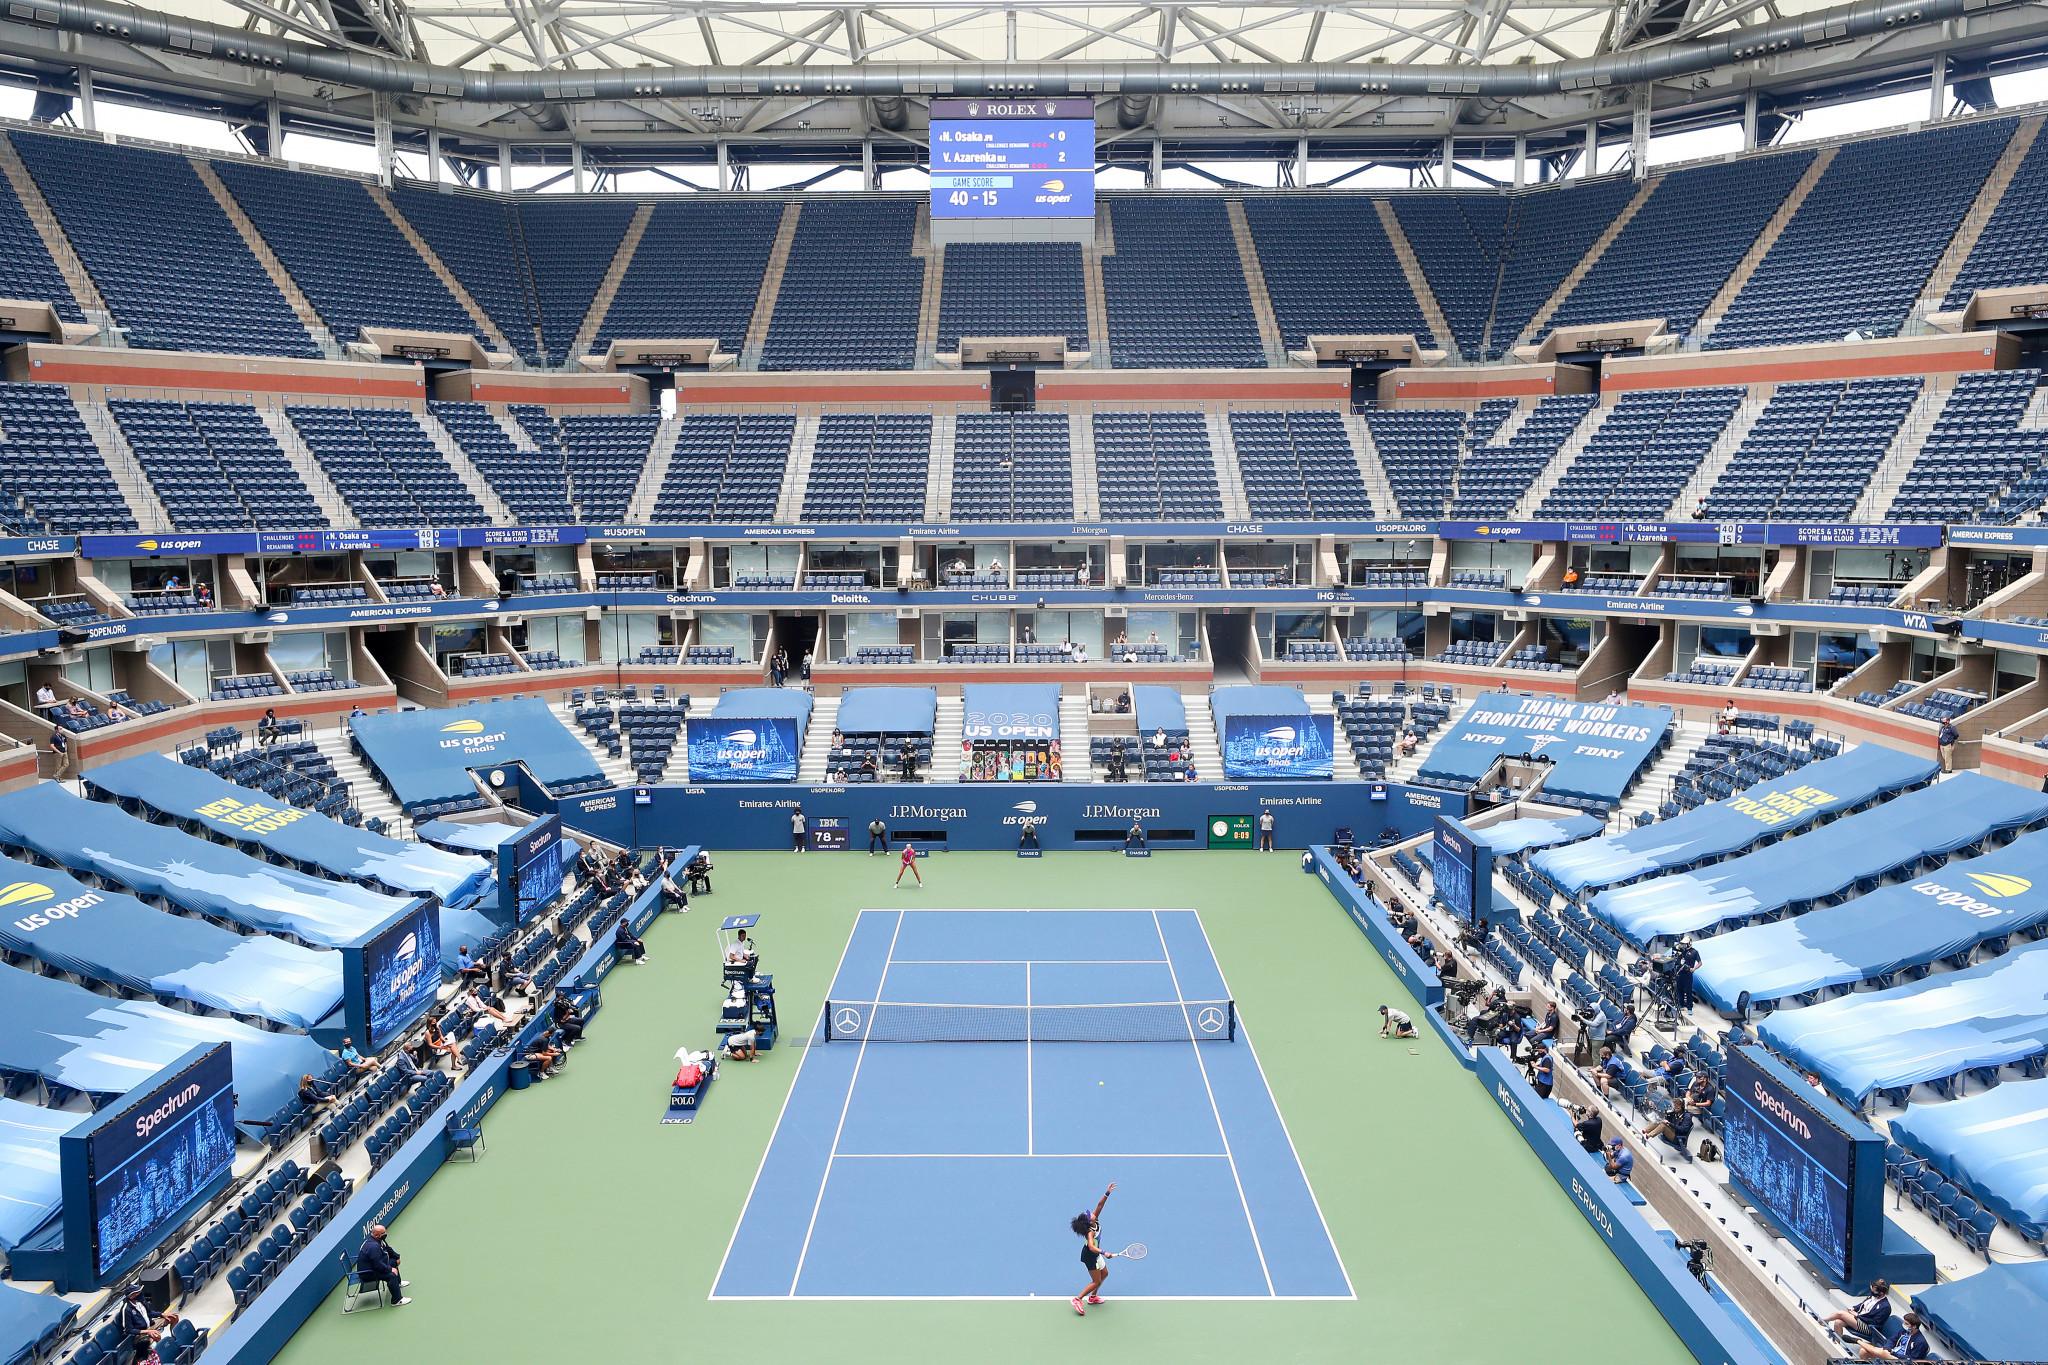 Naomi Osaka won the US Open in an empty Arthur Ashe Stadium ©Getty Images